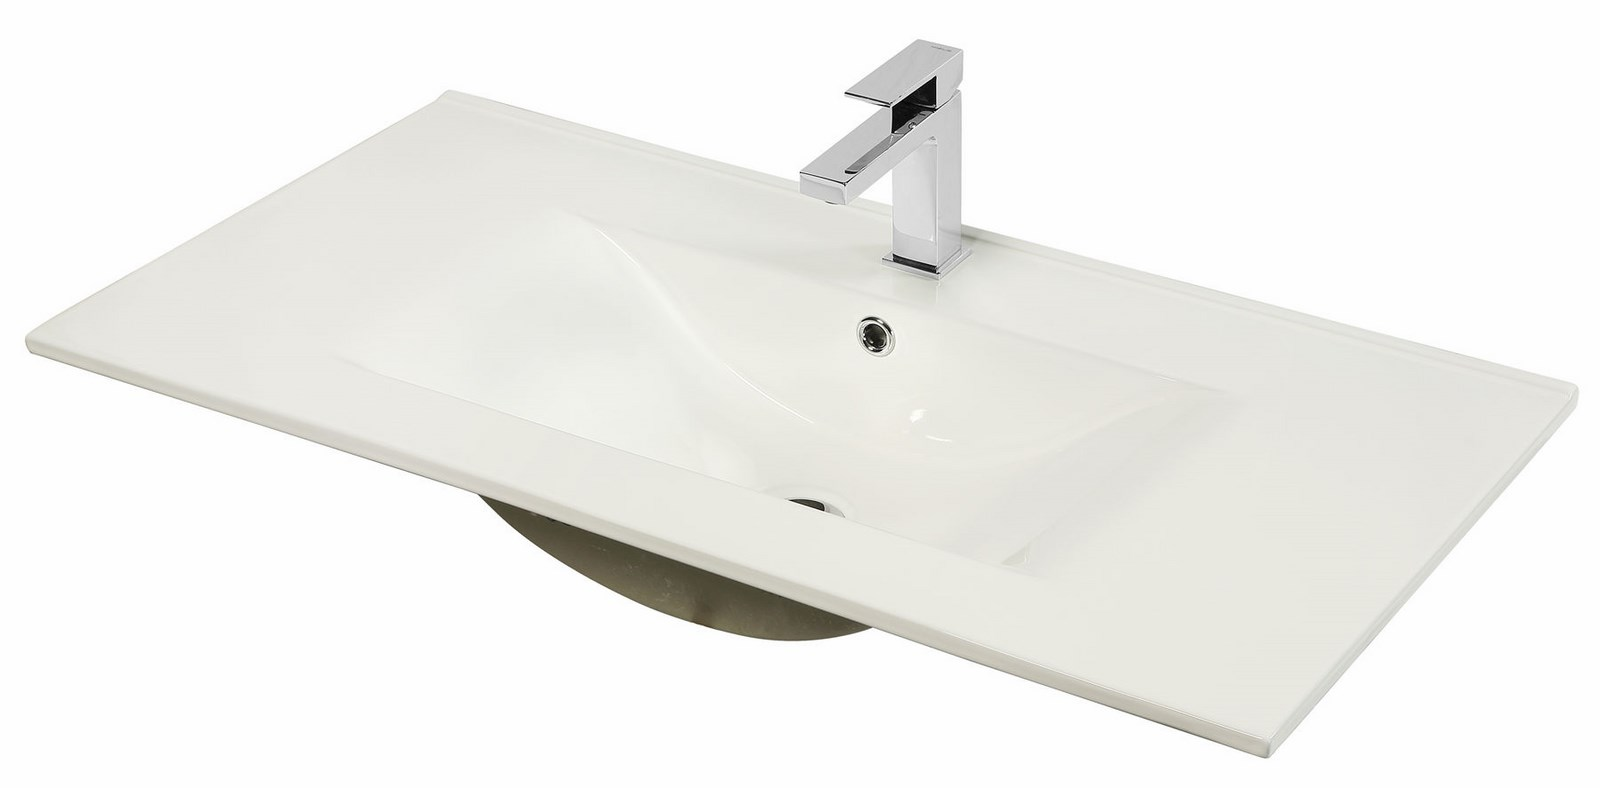 Plan Vasque En Ceramique 90 Cm Discac